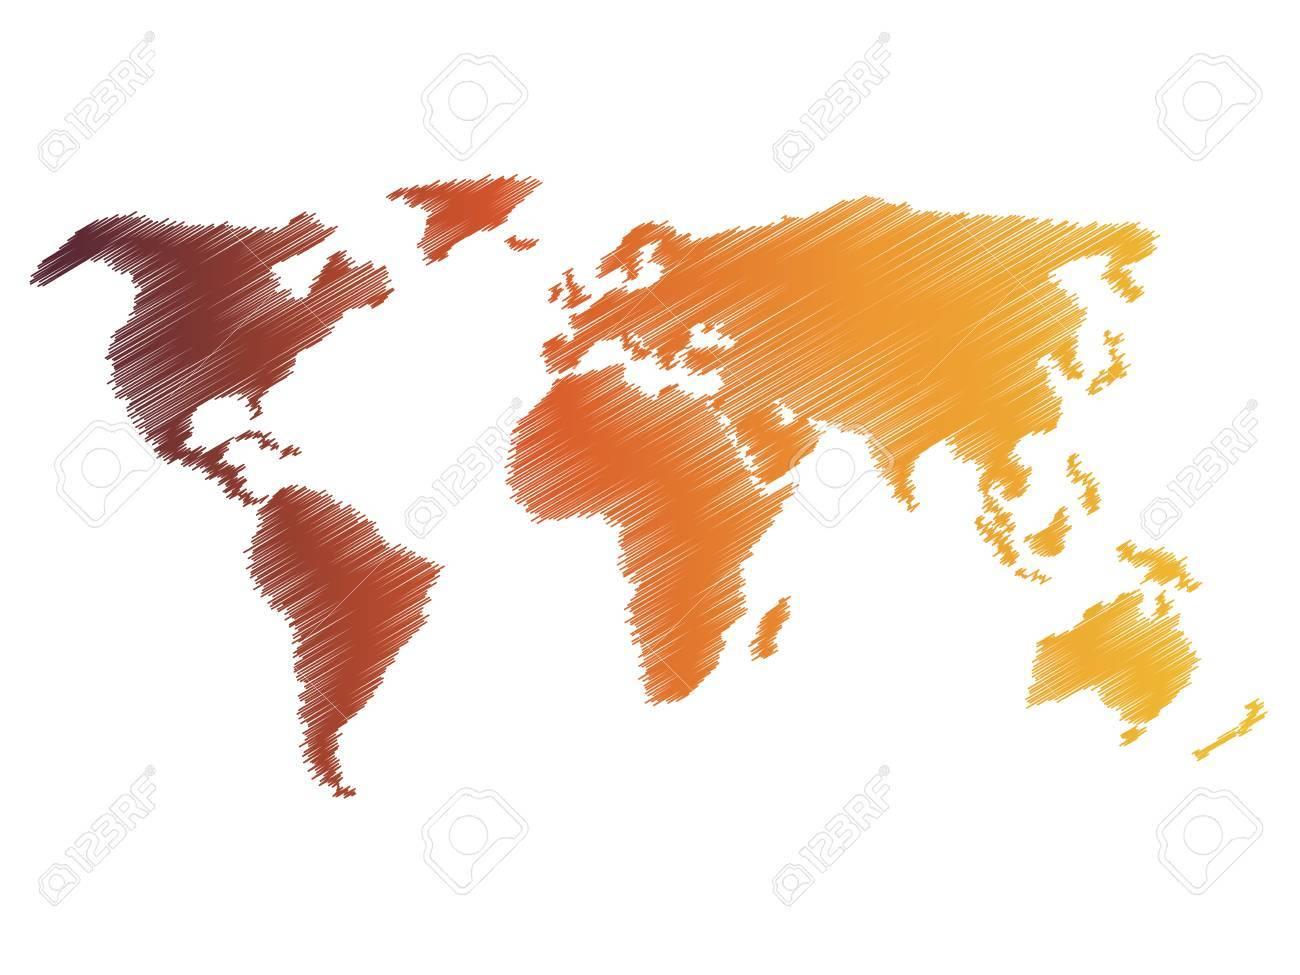 carte du monde dessin simplifié Pencil Scribble Sketch Map Of World. Hand Doodle Drawing. Vector